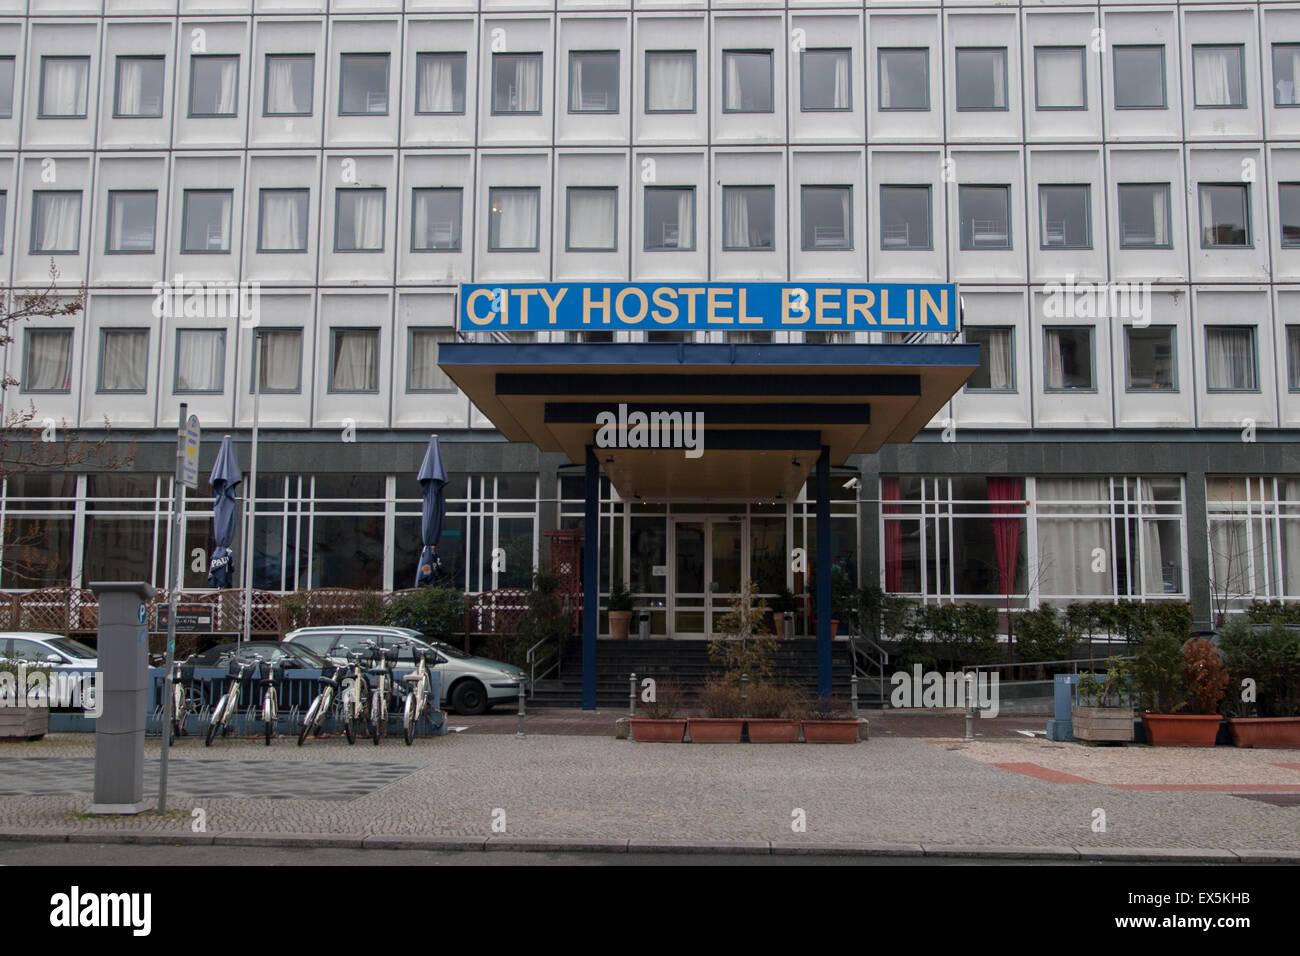 City Hostel Berlin Germany Stock Photo 84947671 Alamy